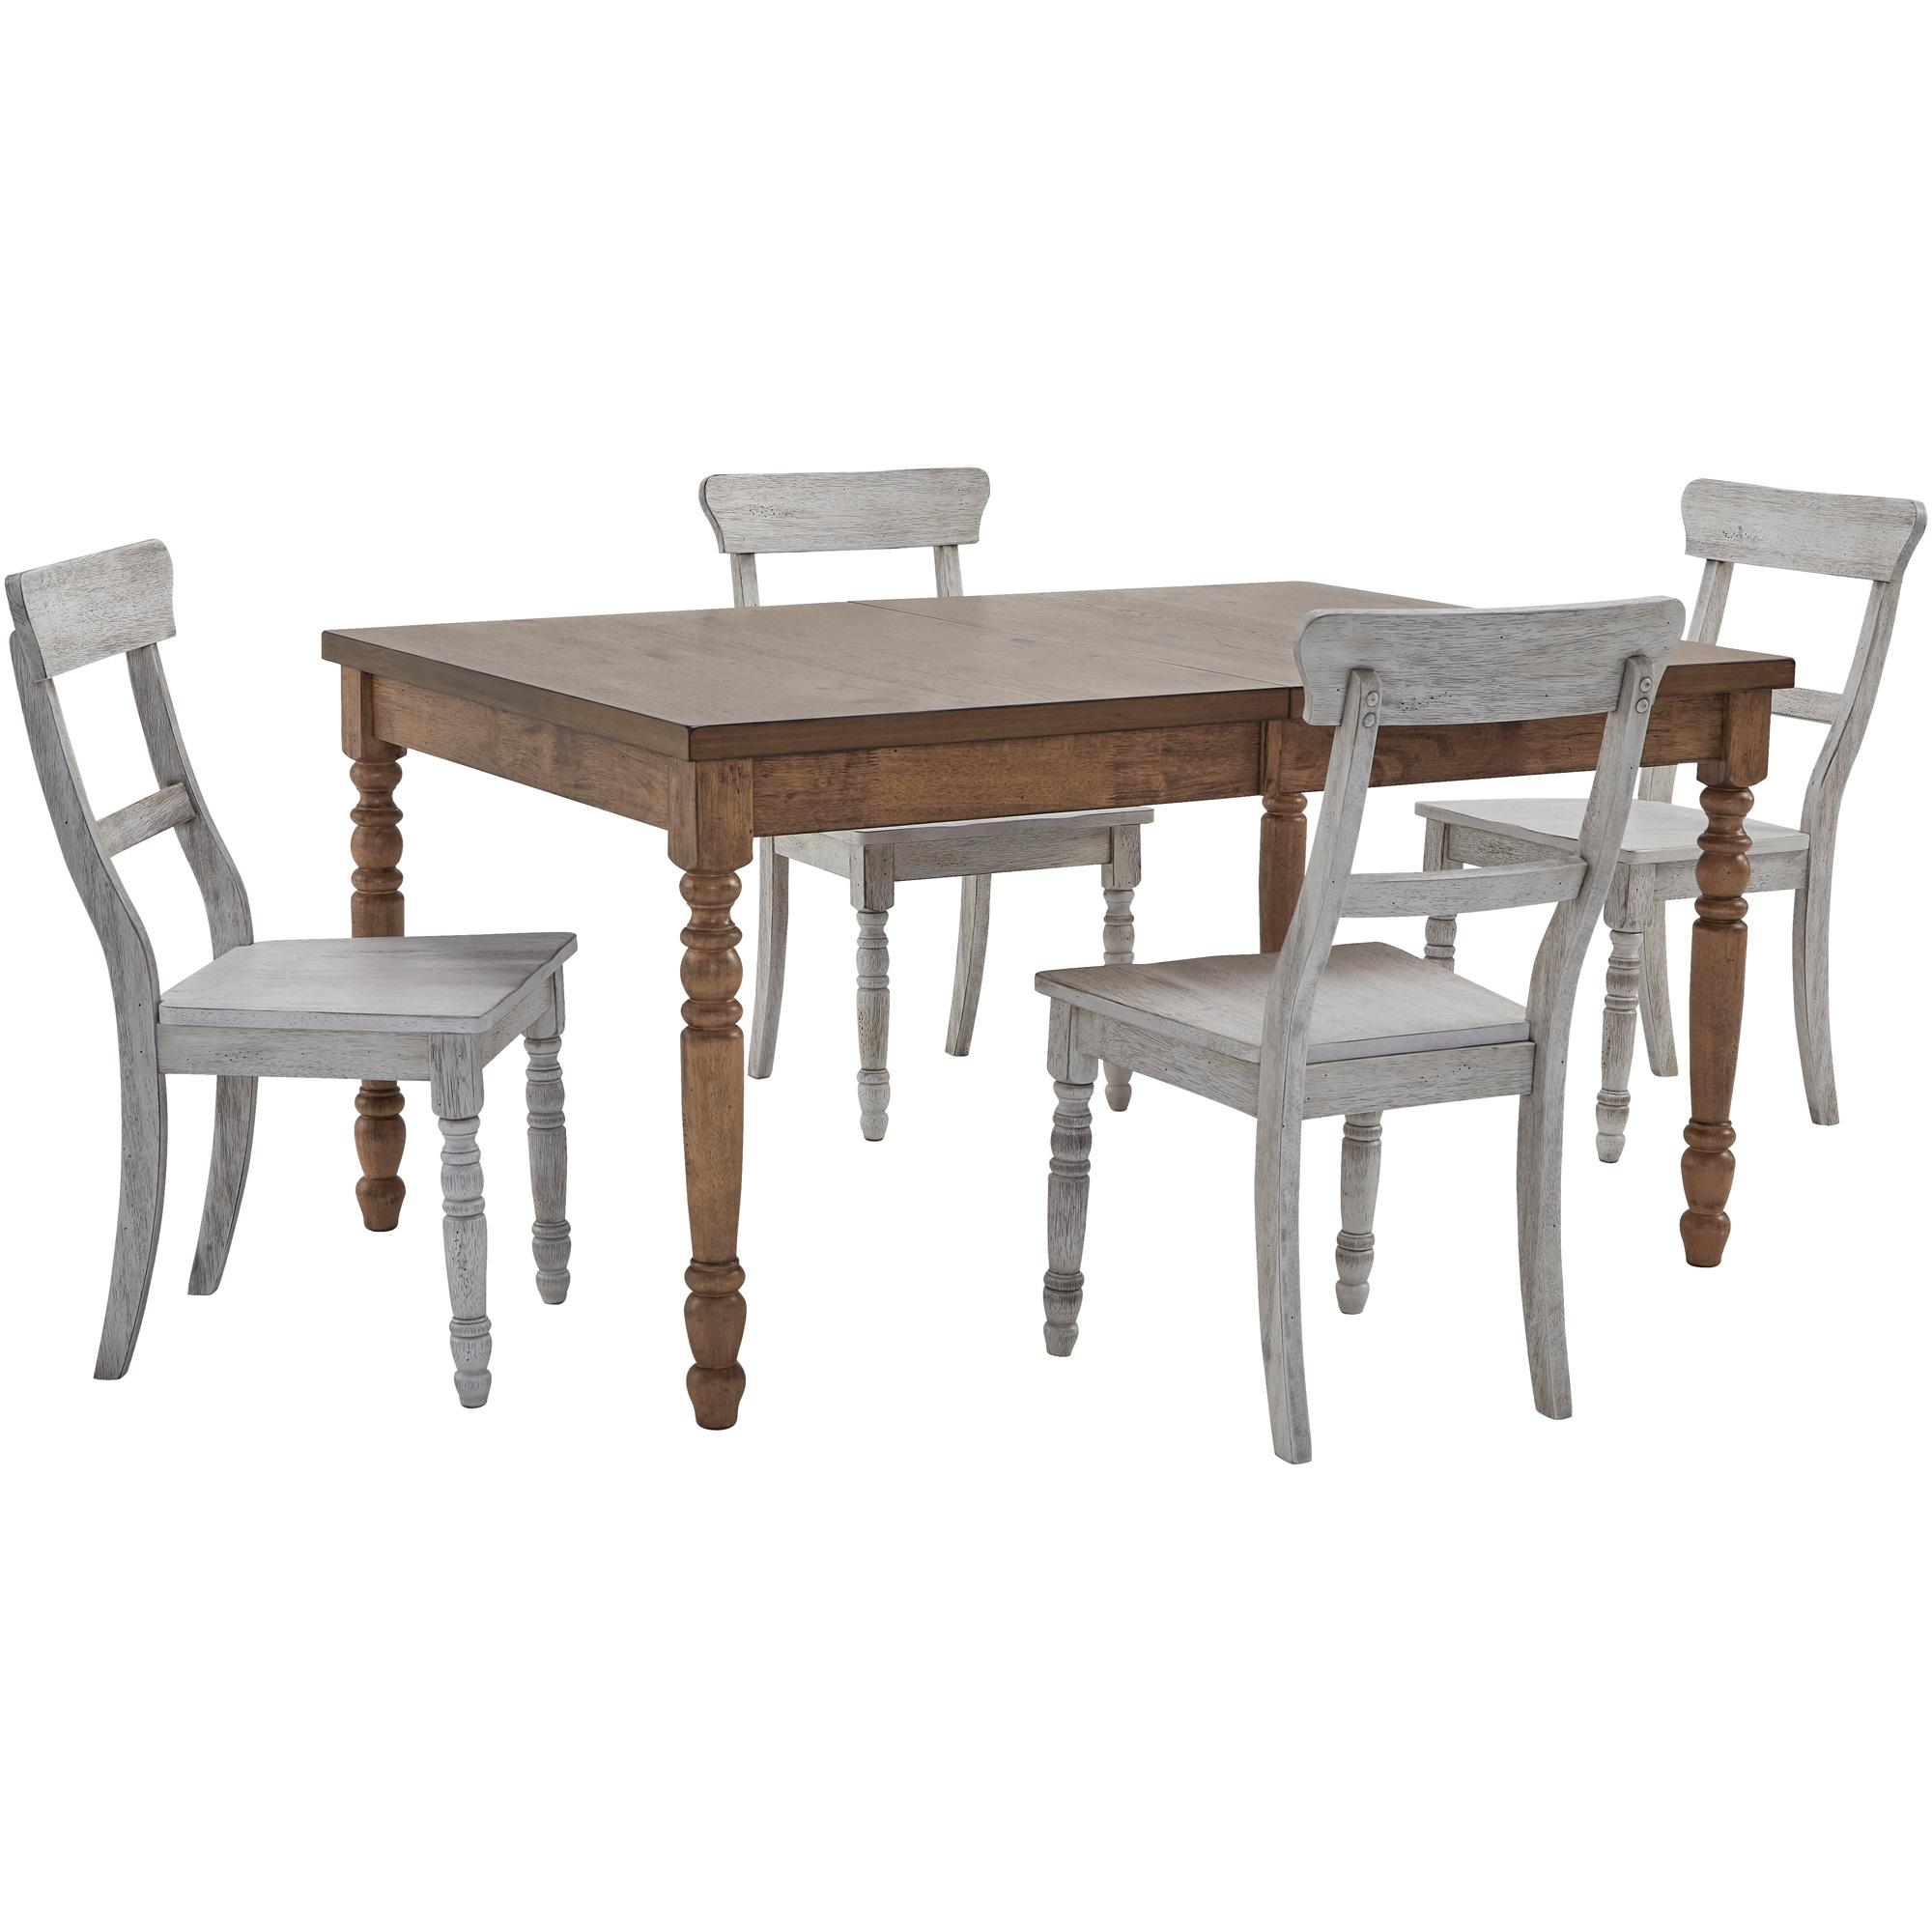 Progressive Furniture Inc. | Savannah Court Antique Oak and White 5 Piece Dining Set